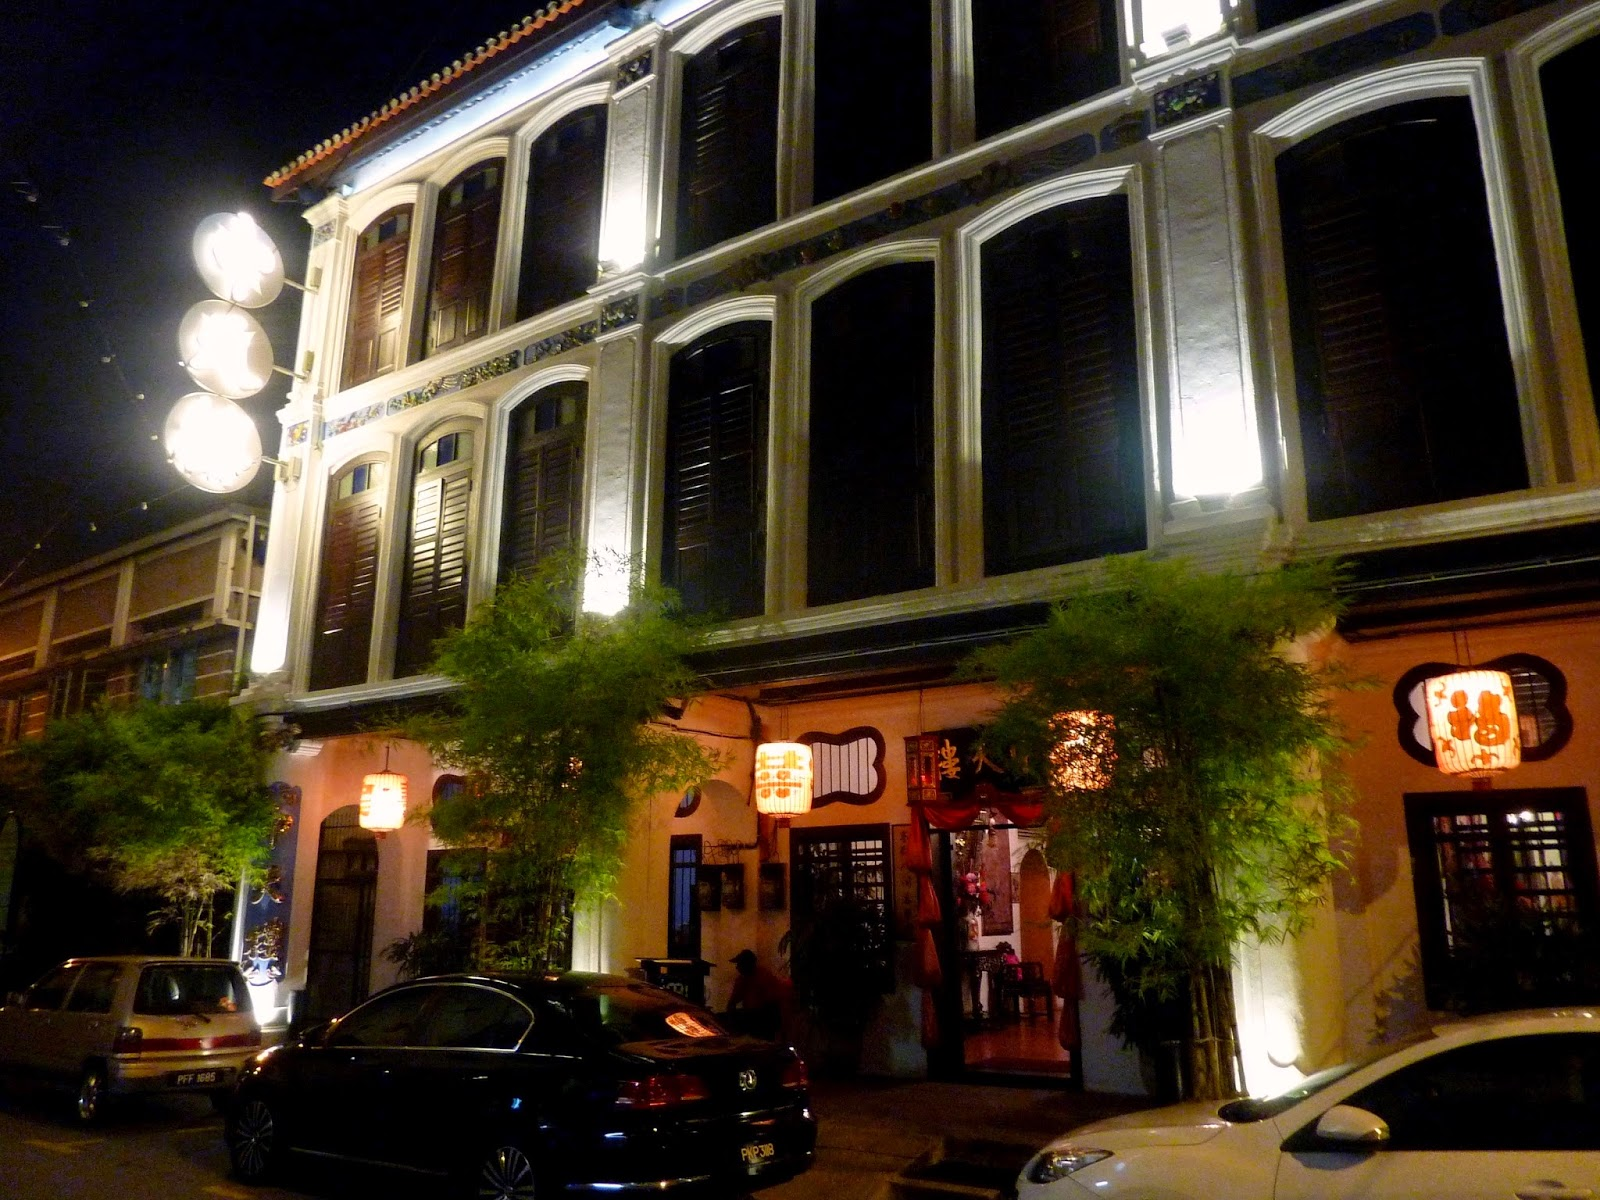 penang food for thought 1881 chong tian hotel rh penangfoodforthought com